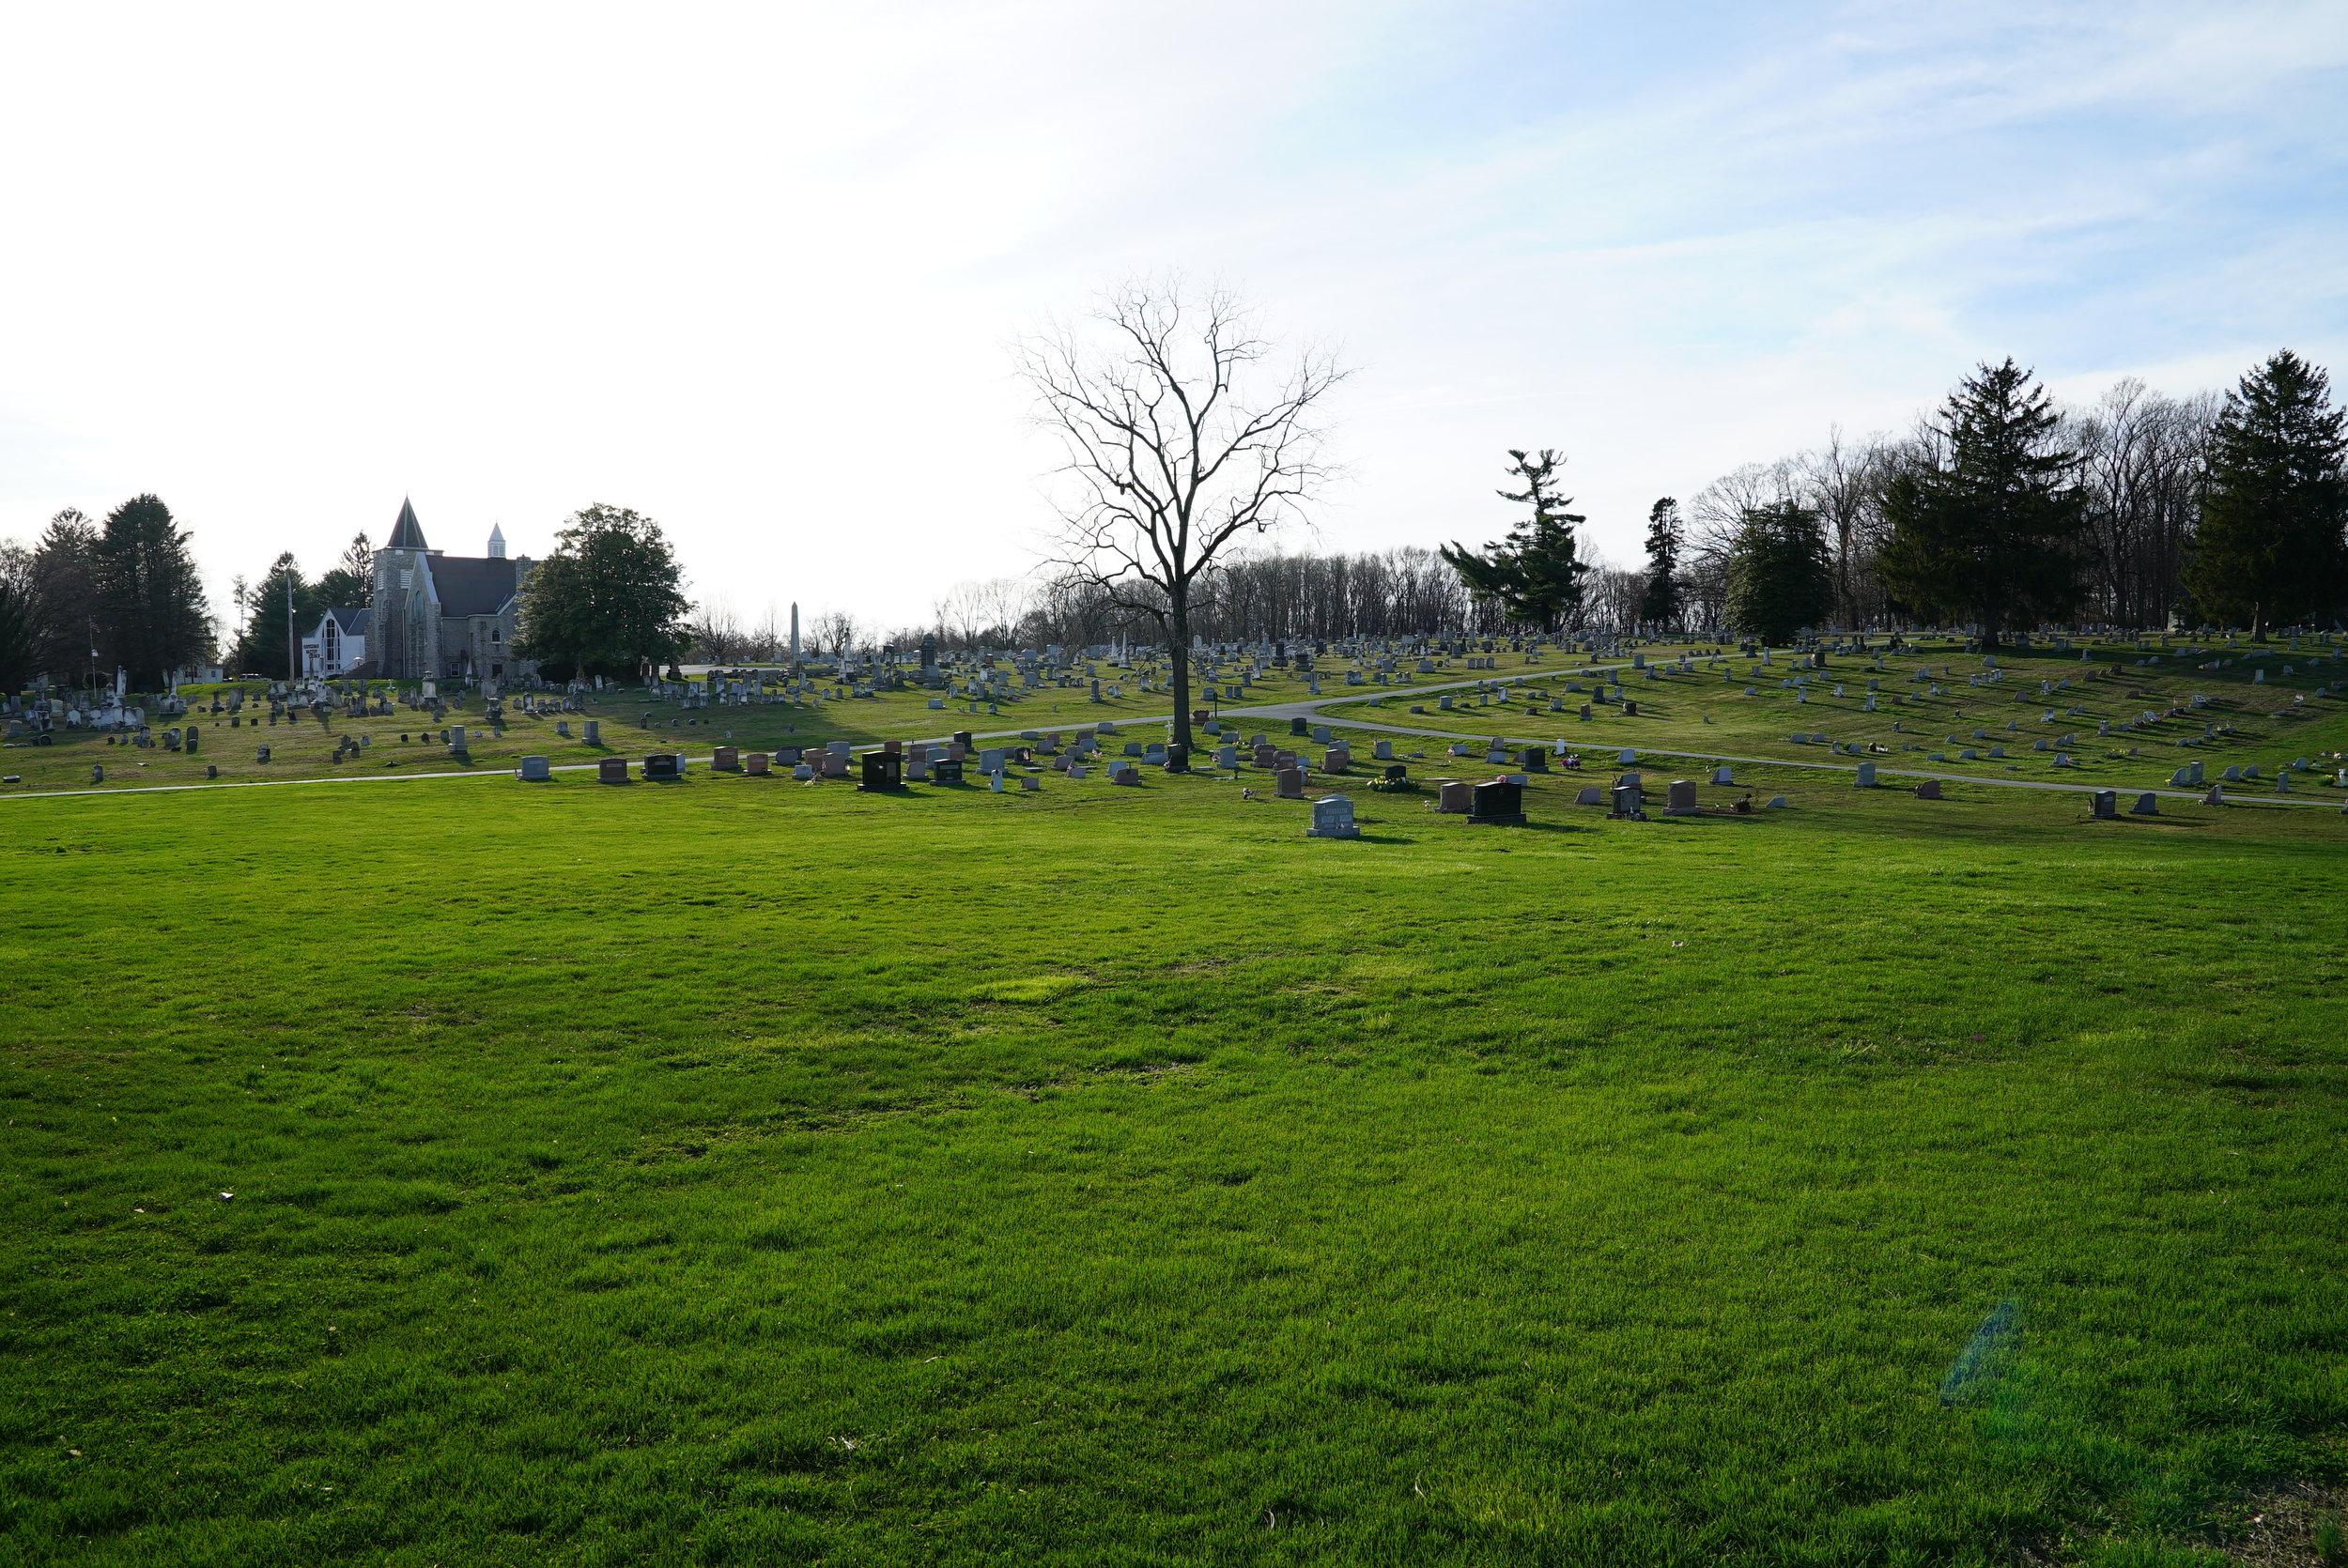 Plenty of burial space still left at Hephzibah Baptist Church Cemetery.